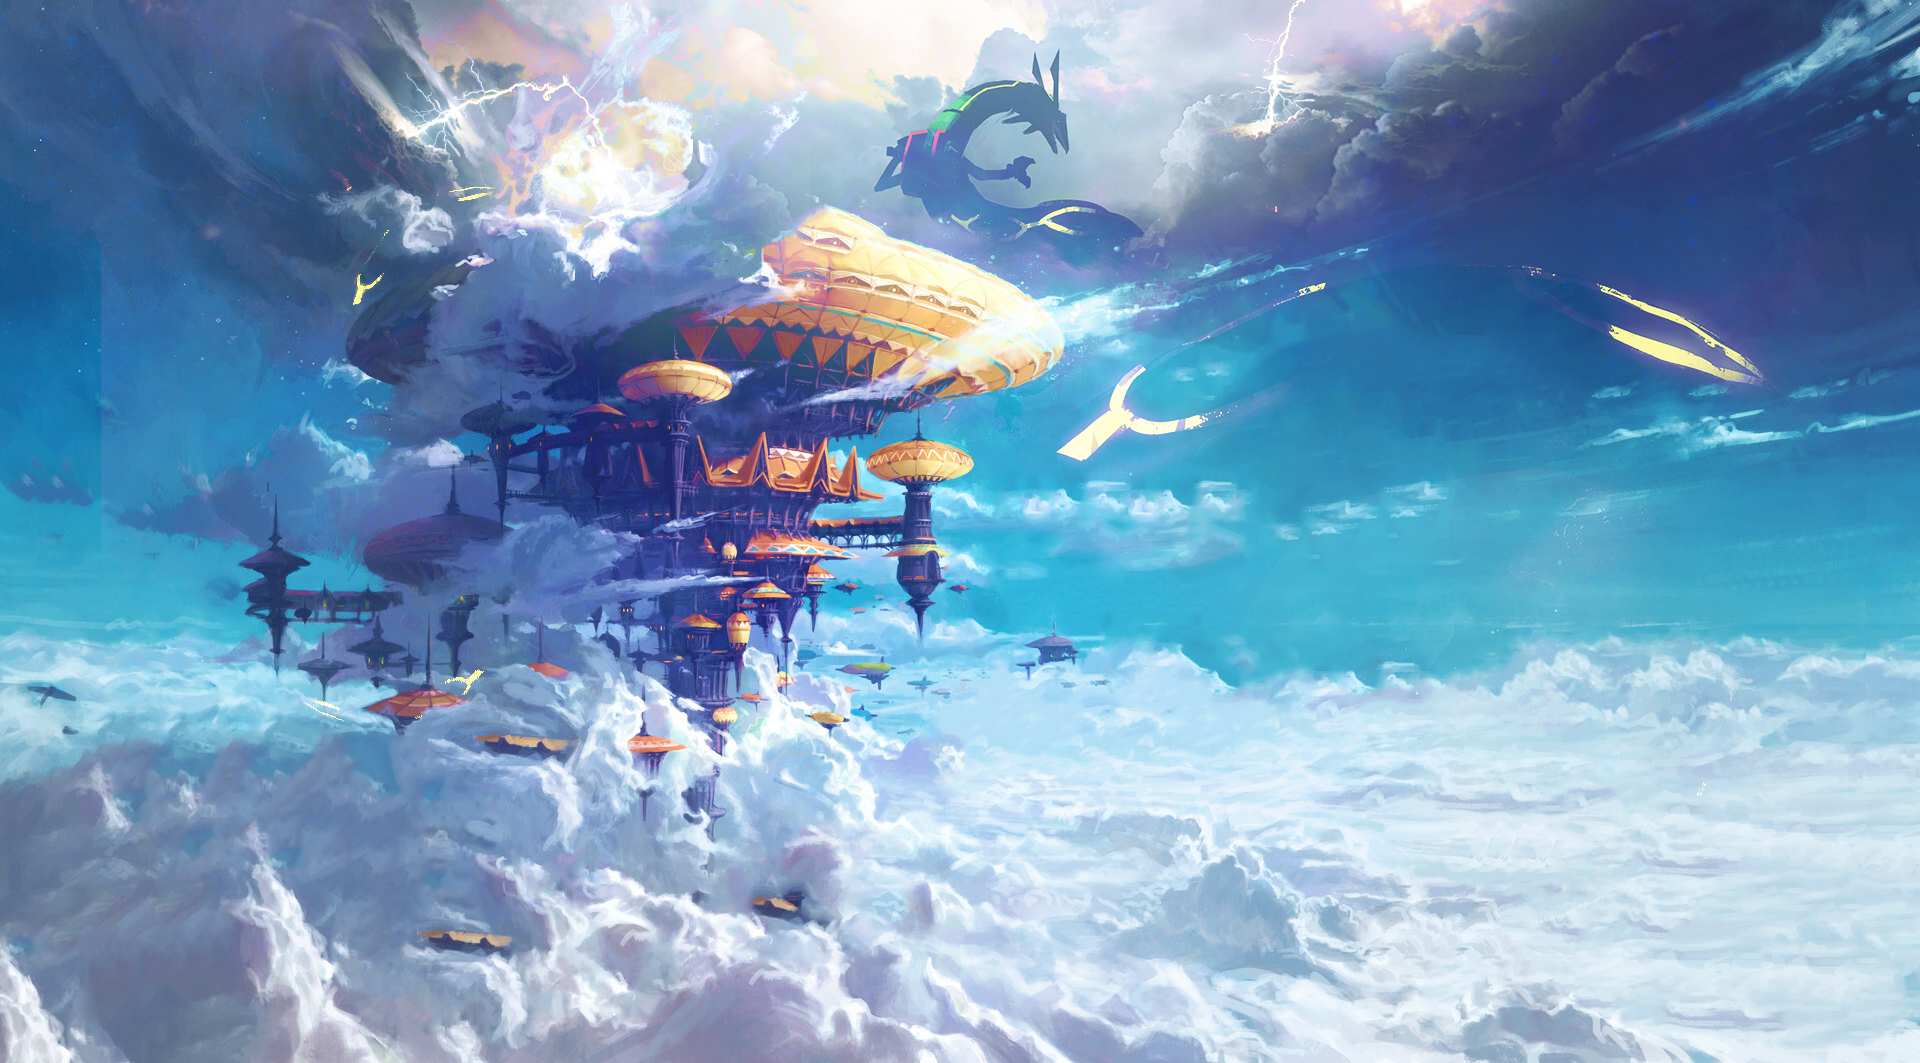 General 1920x1063 clouds Rayquaza Pokémon anime digital art sky blue